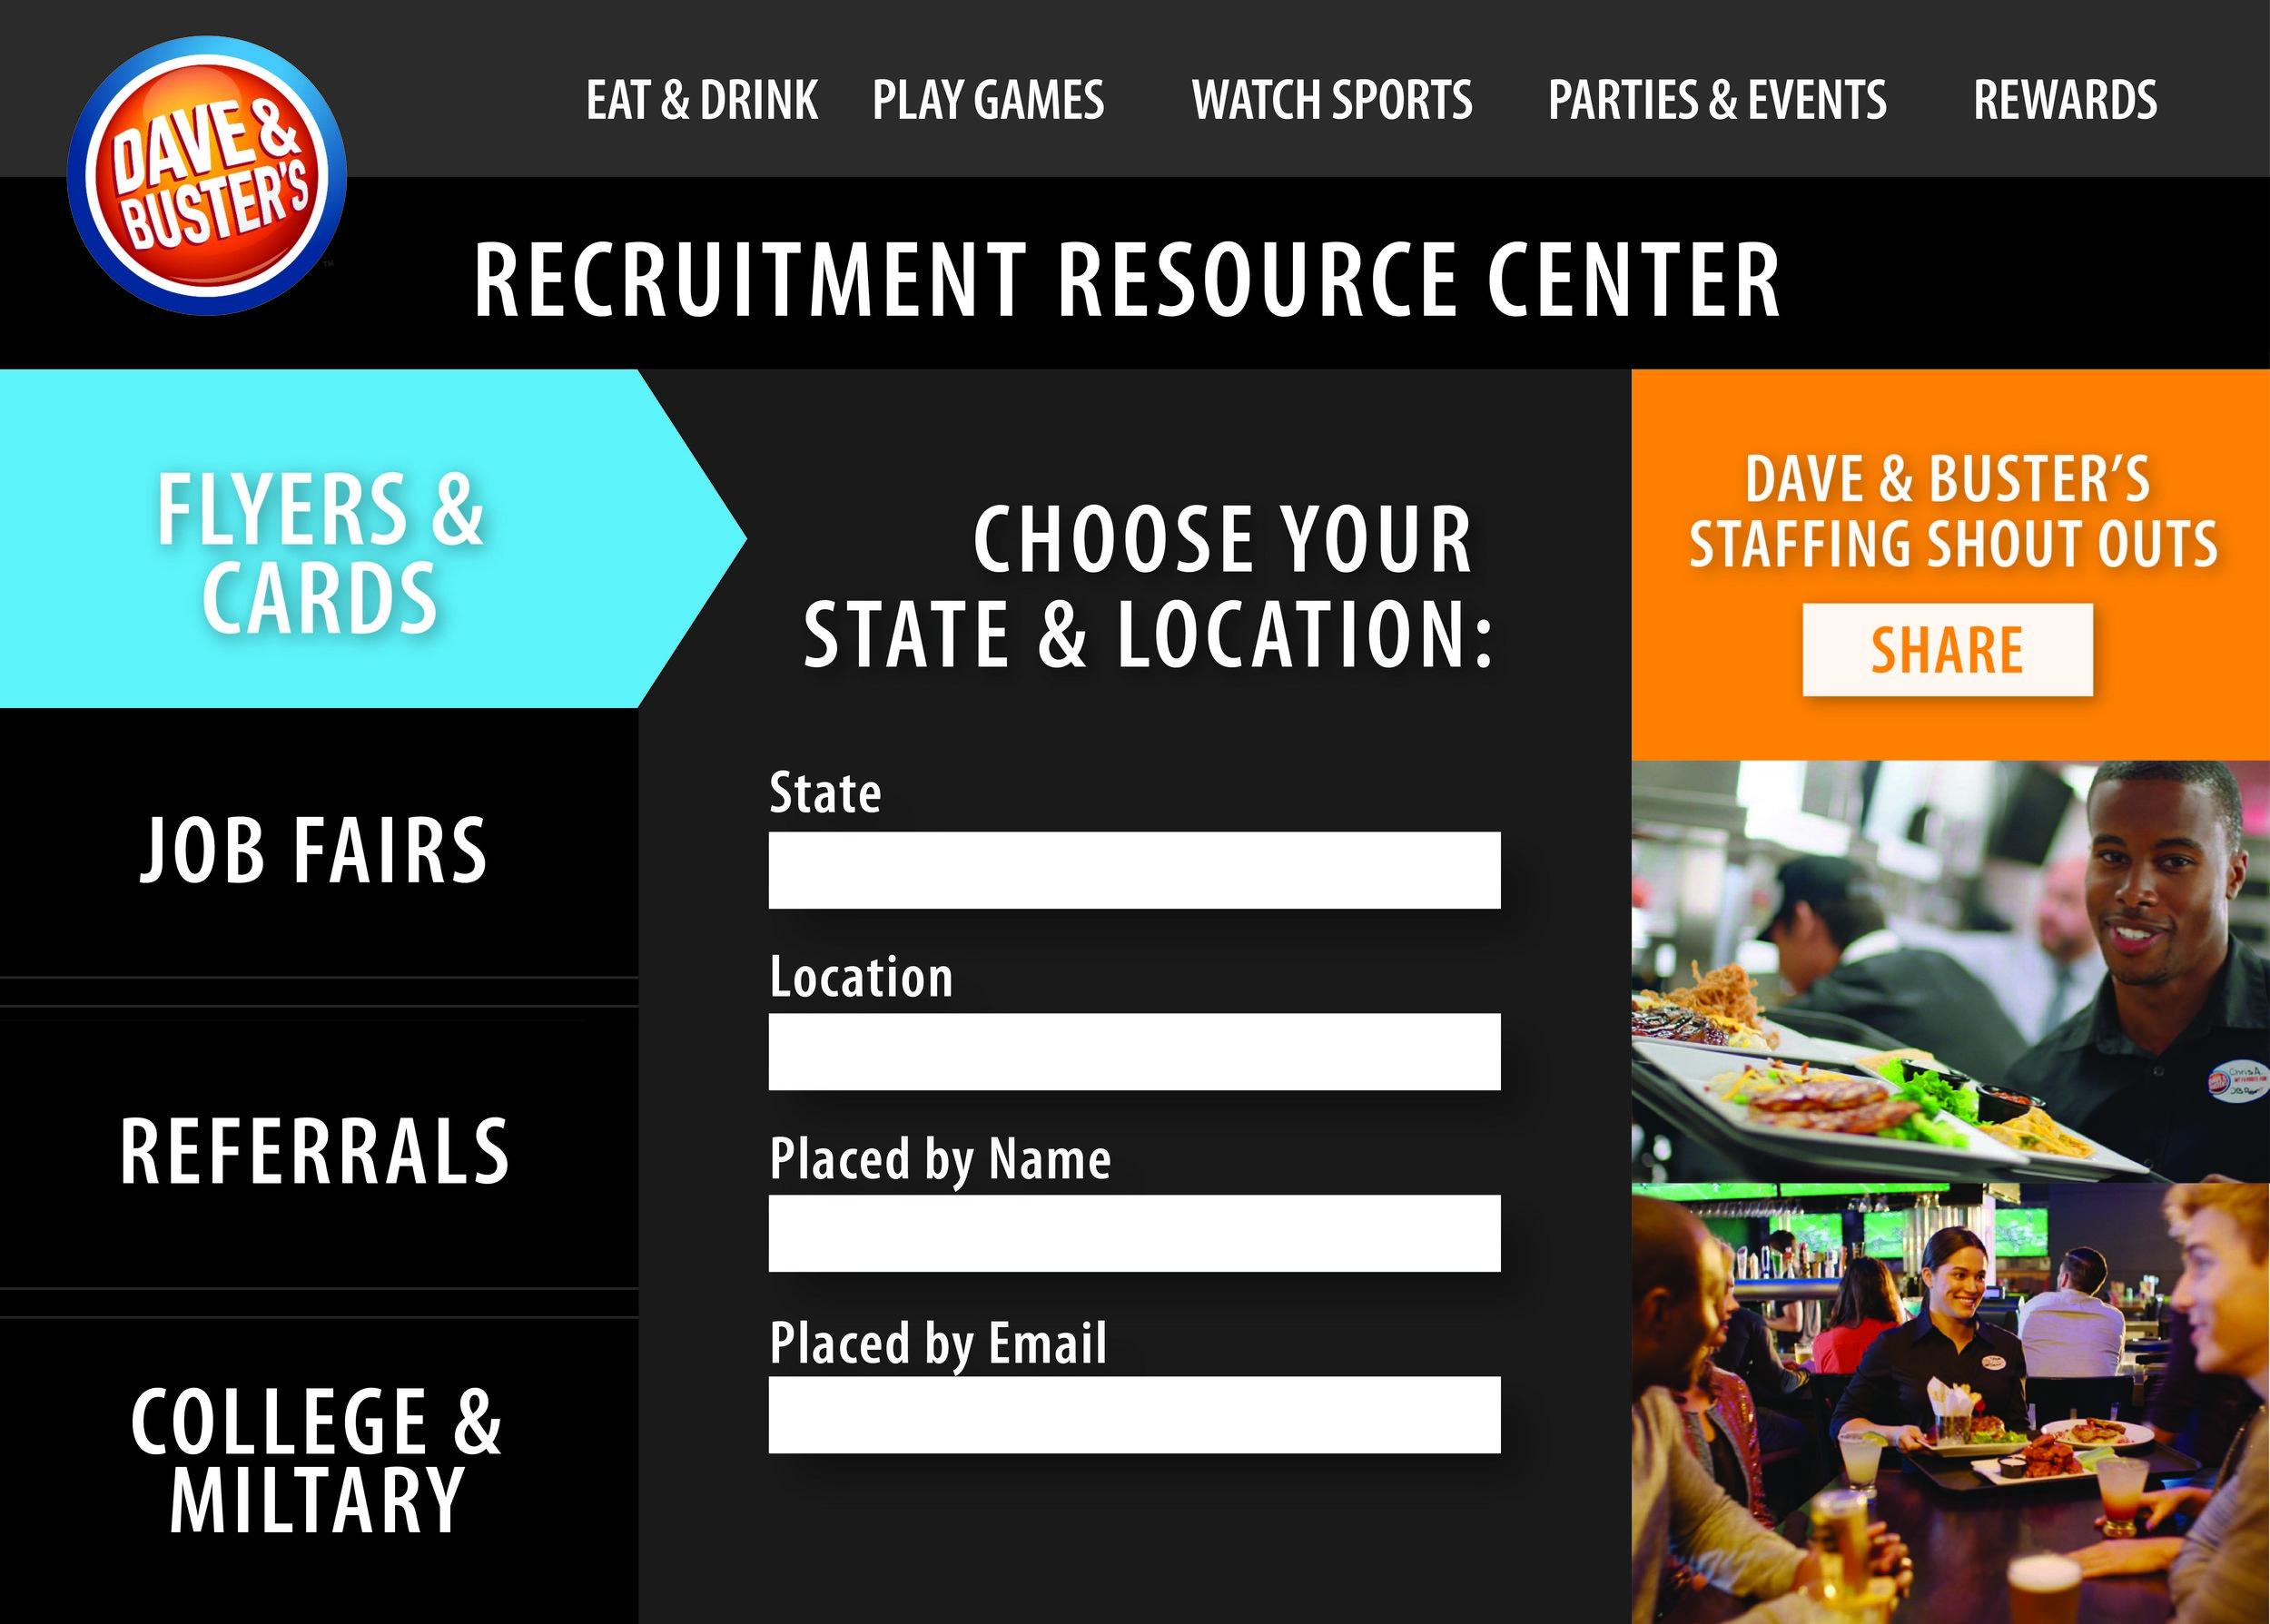 d&b recruitment page mock-01.jpg